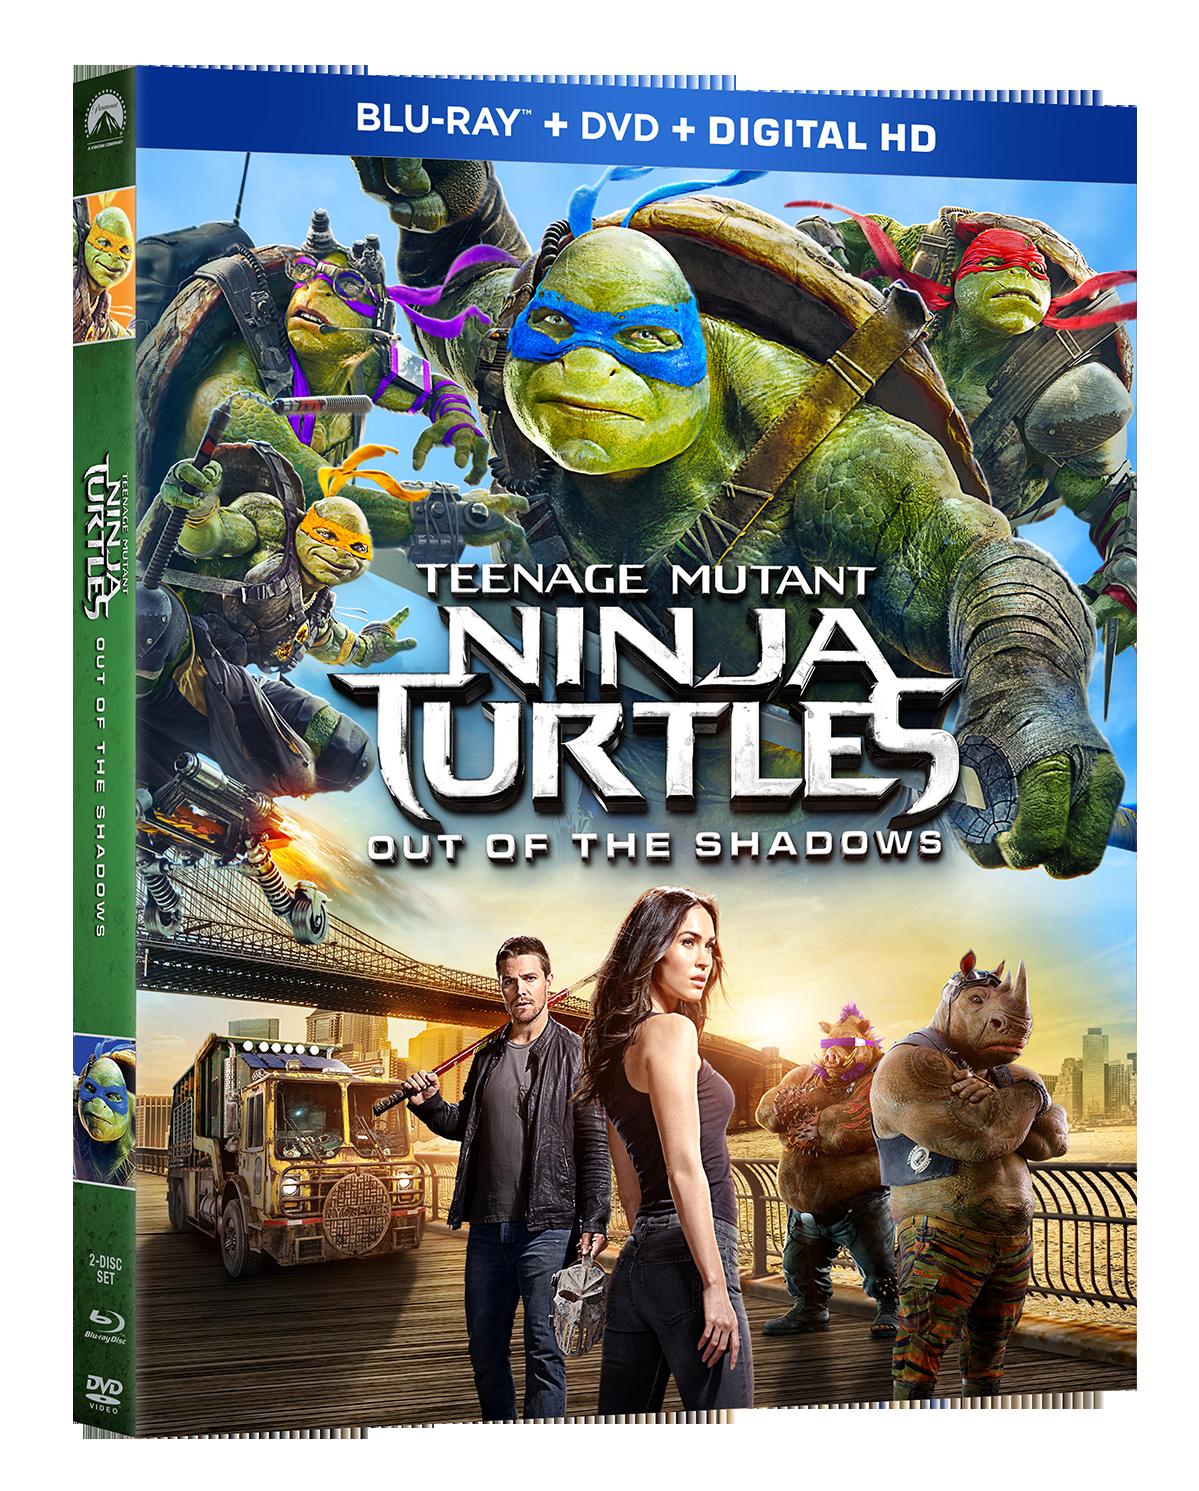 The Lunchbox Movies Dual Audio 720p Hd ariagil TNT2HE-001_BDOSleeve_3D-DMUB_01_R10